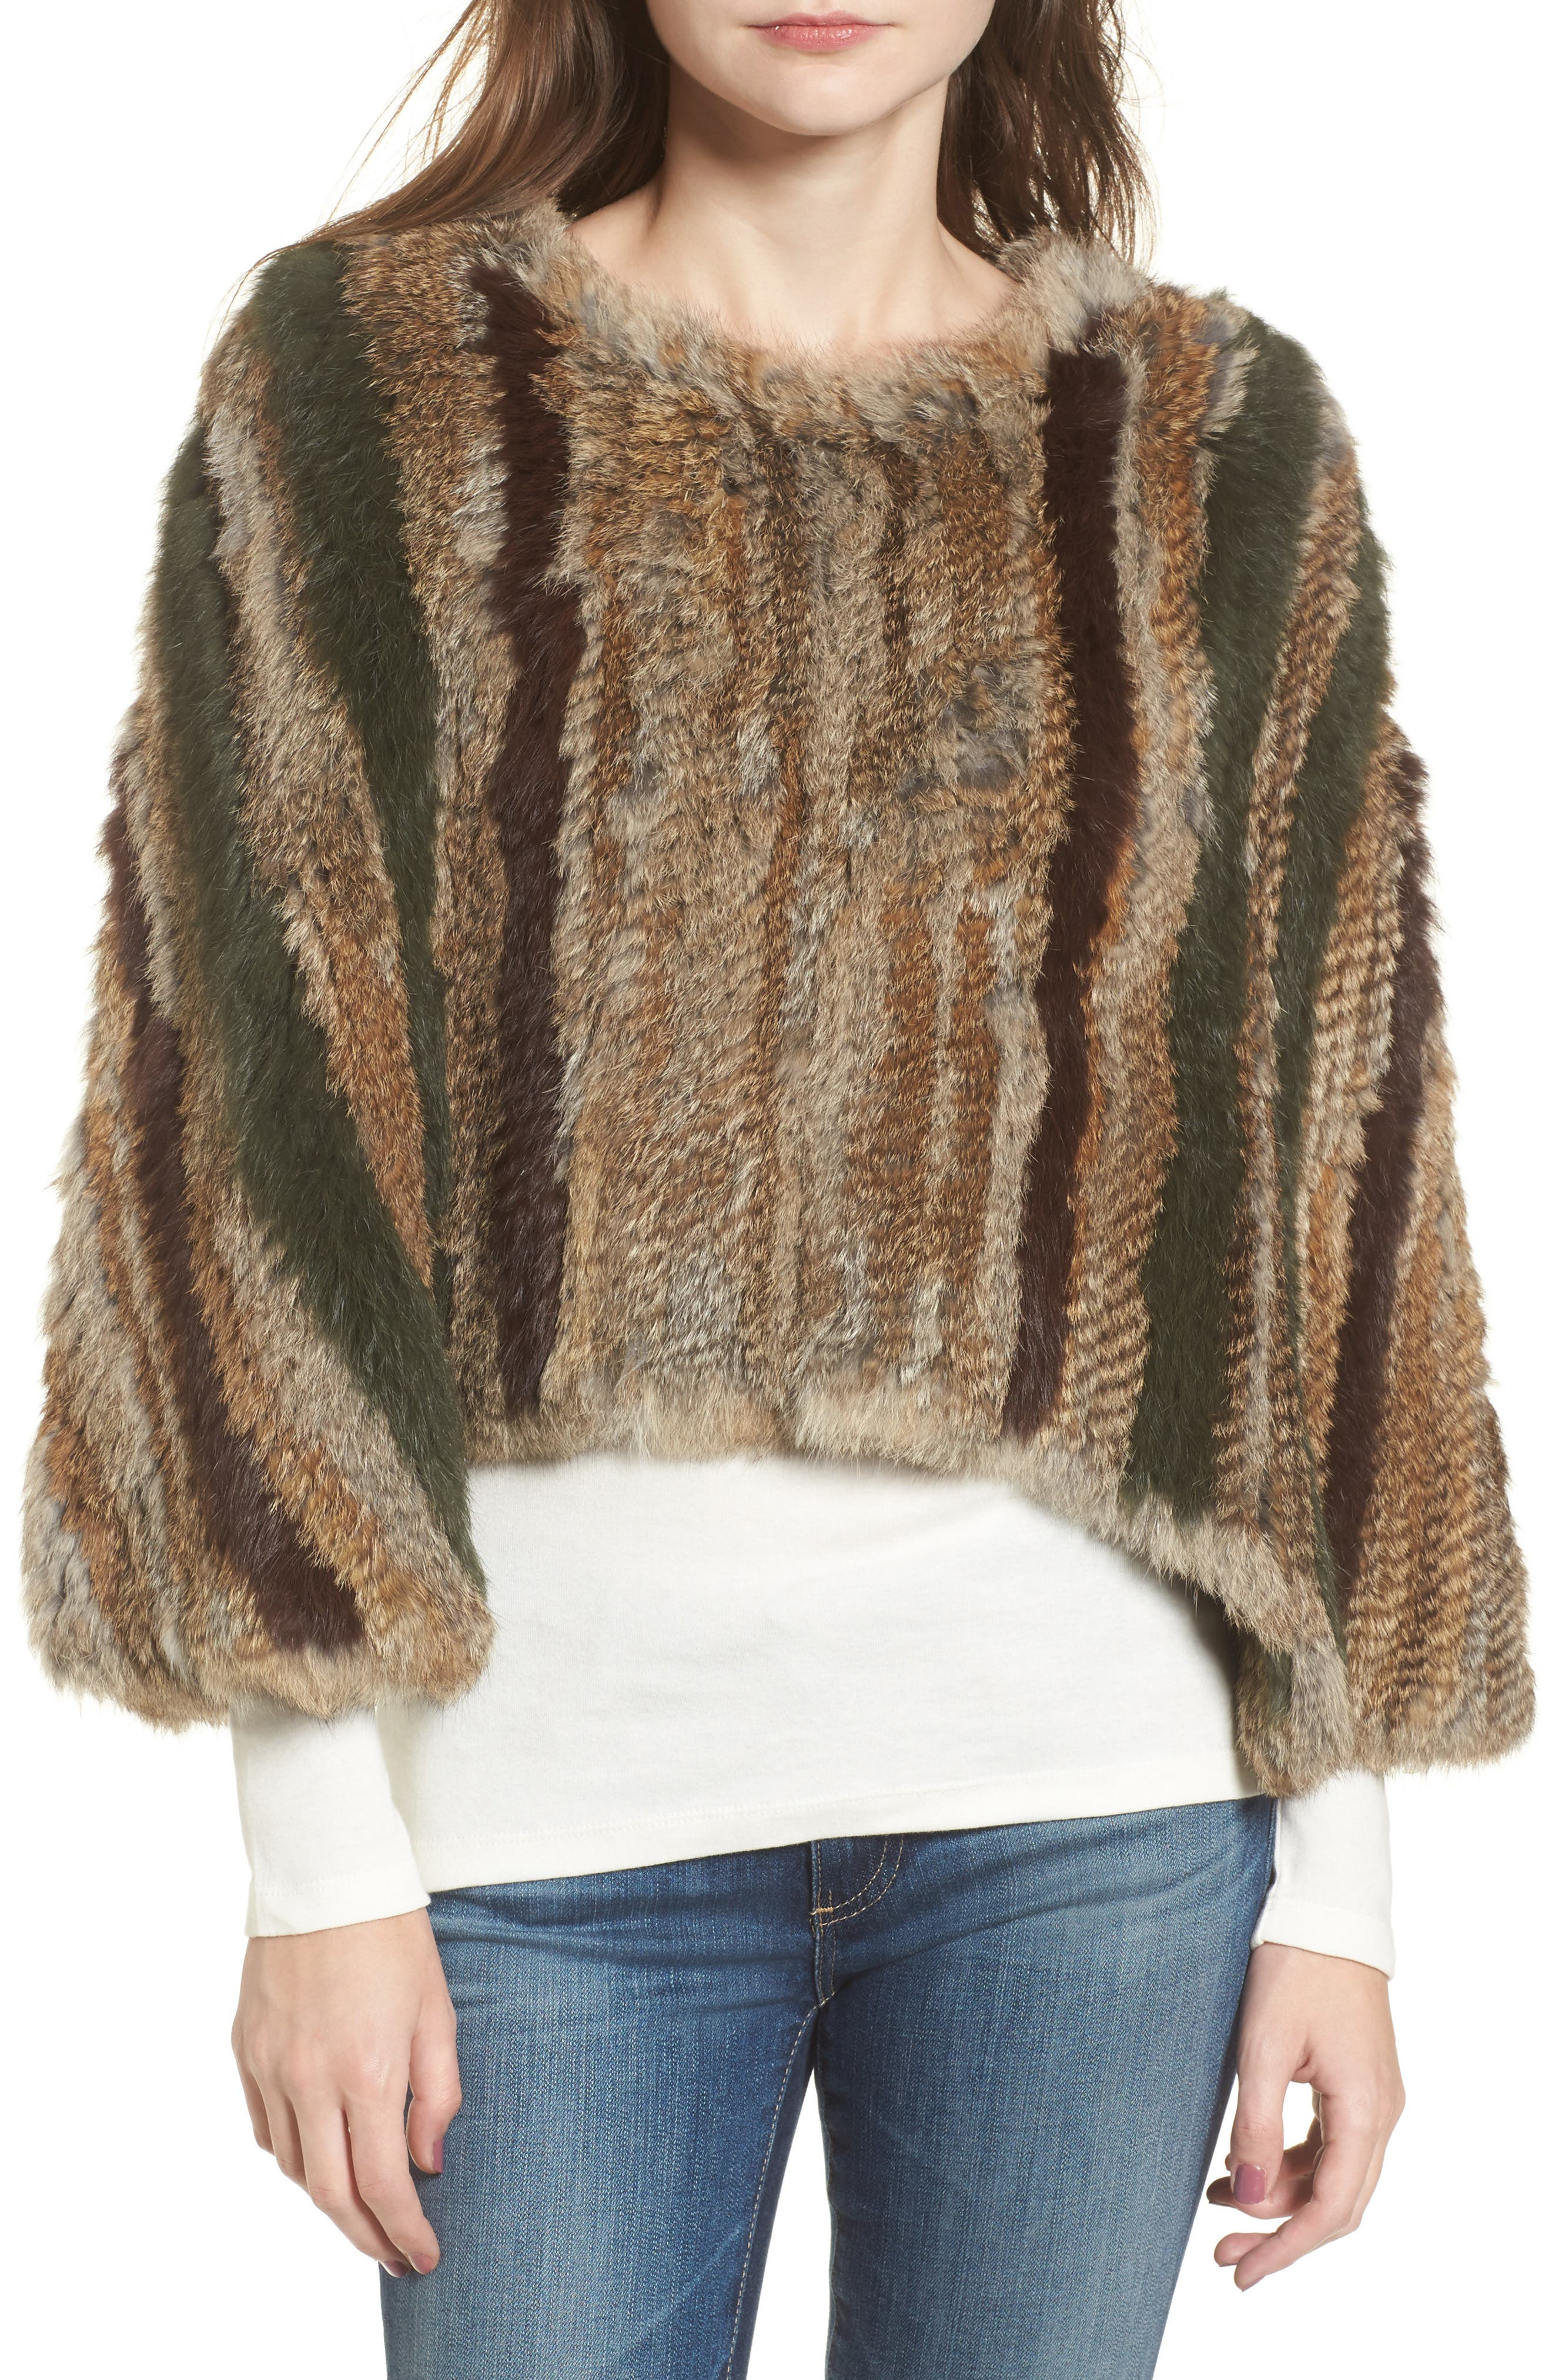 Main Image - BNCI Nomad Genuine Rabbit Fur Pullover